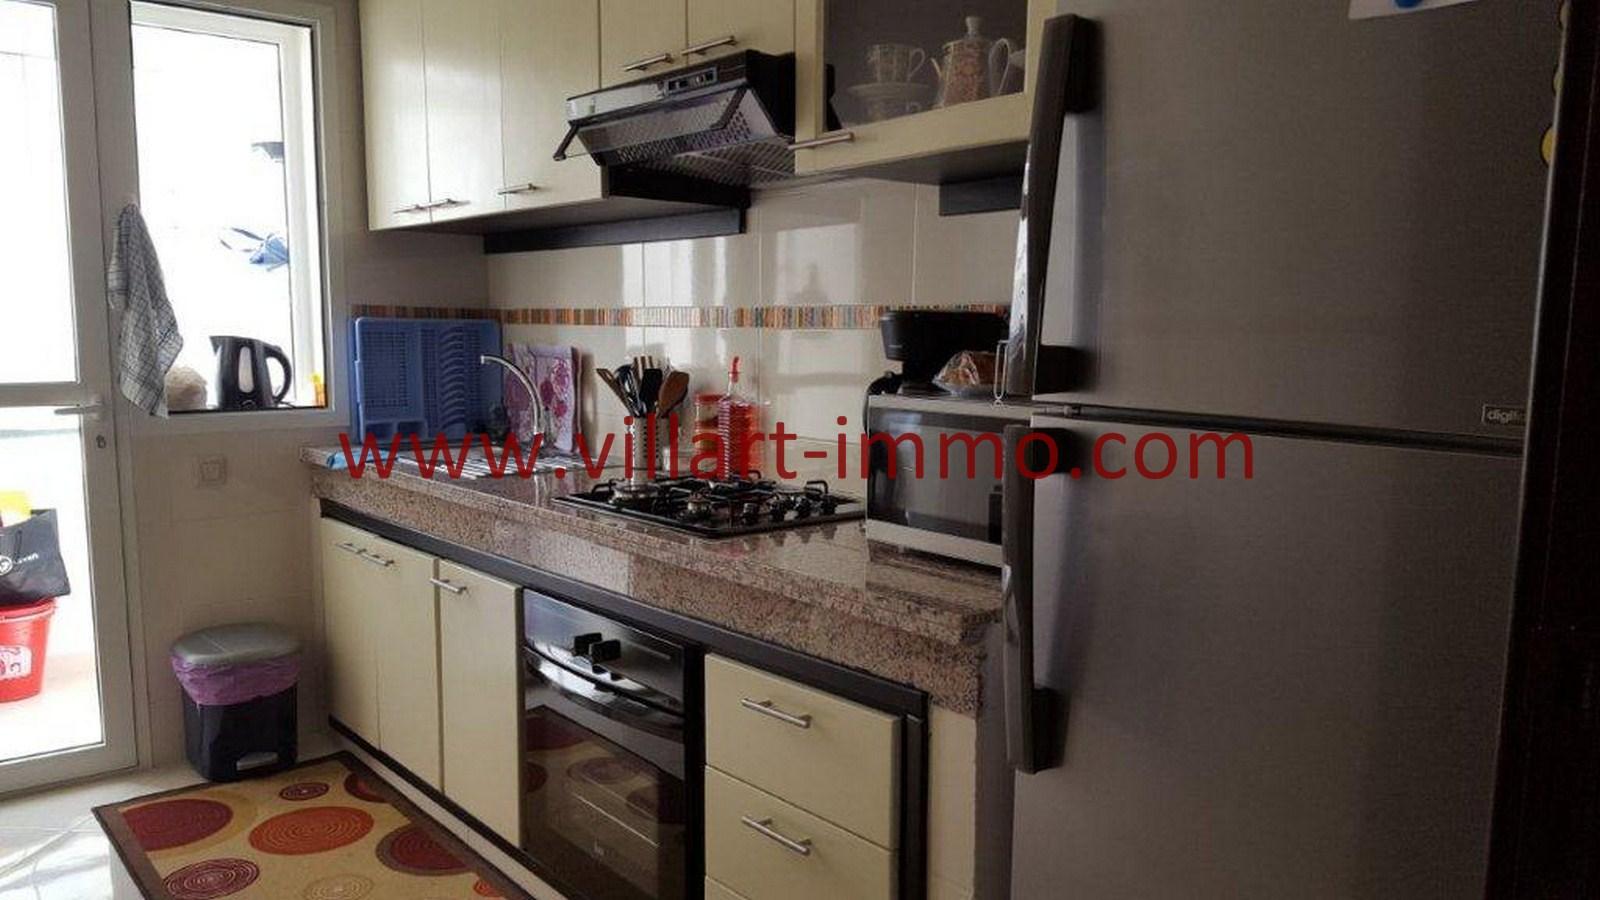 5-Vente-Appartement-Tanger-Cuisine-VA514-Route de Rabat-Villart Immo